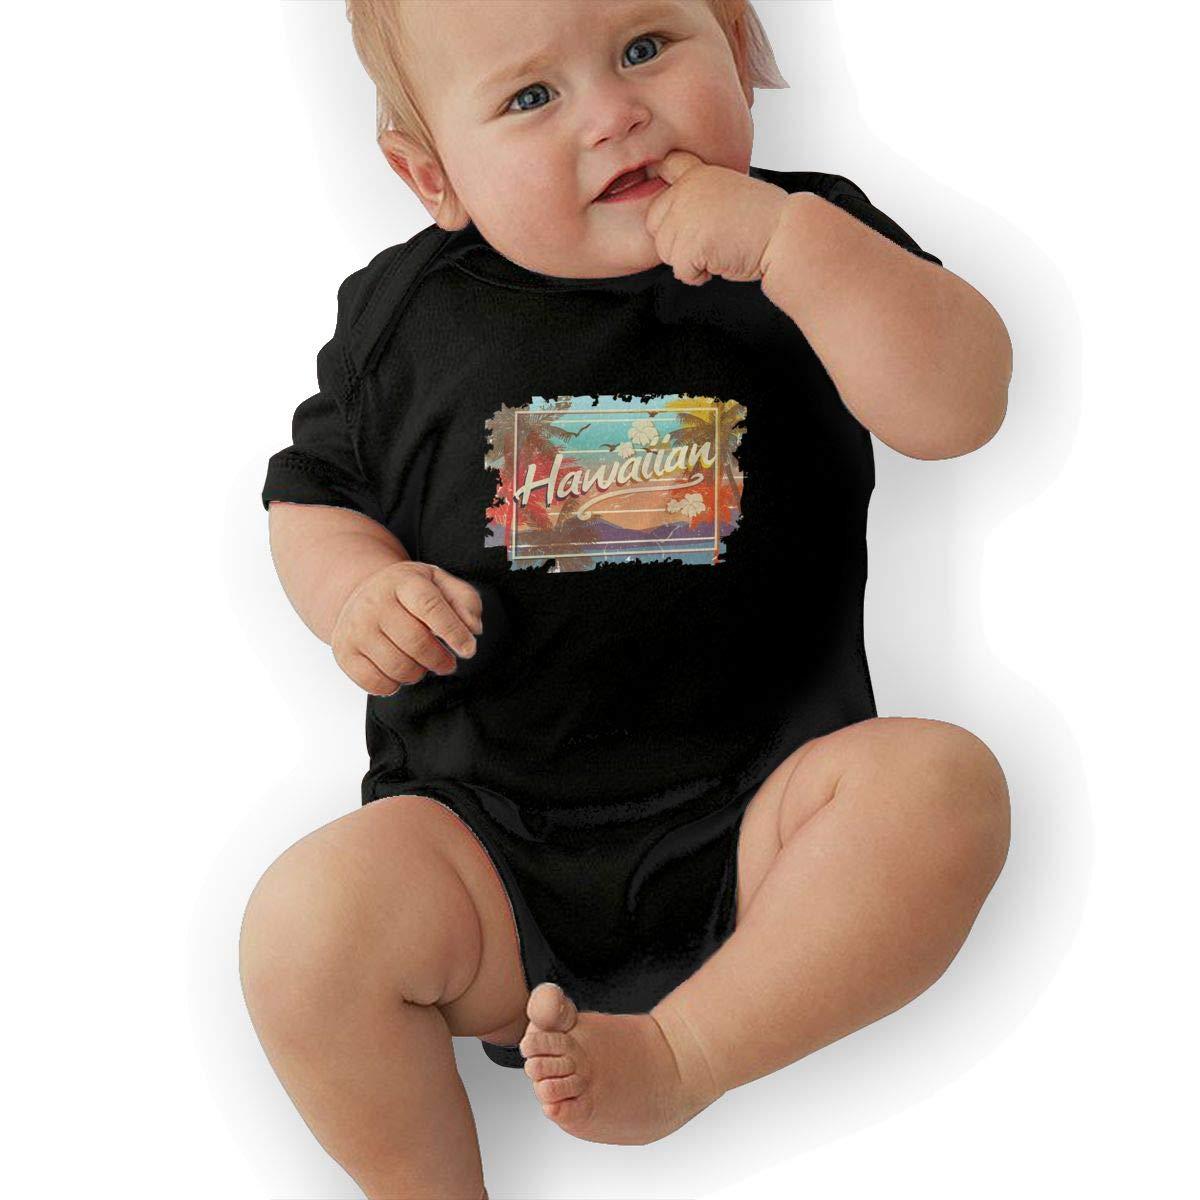 Bodysuits Clothes Onesies Jumpsuits Outfits Black Hawaiian Islands Art Design Baby Pajamas